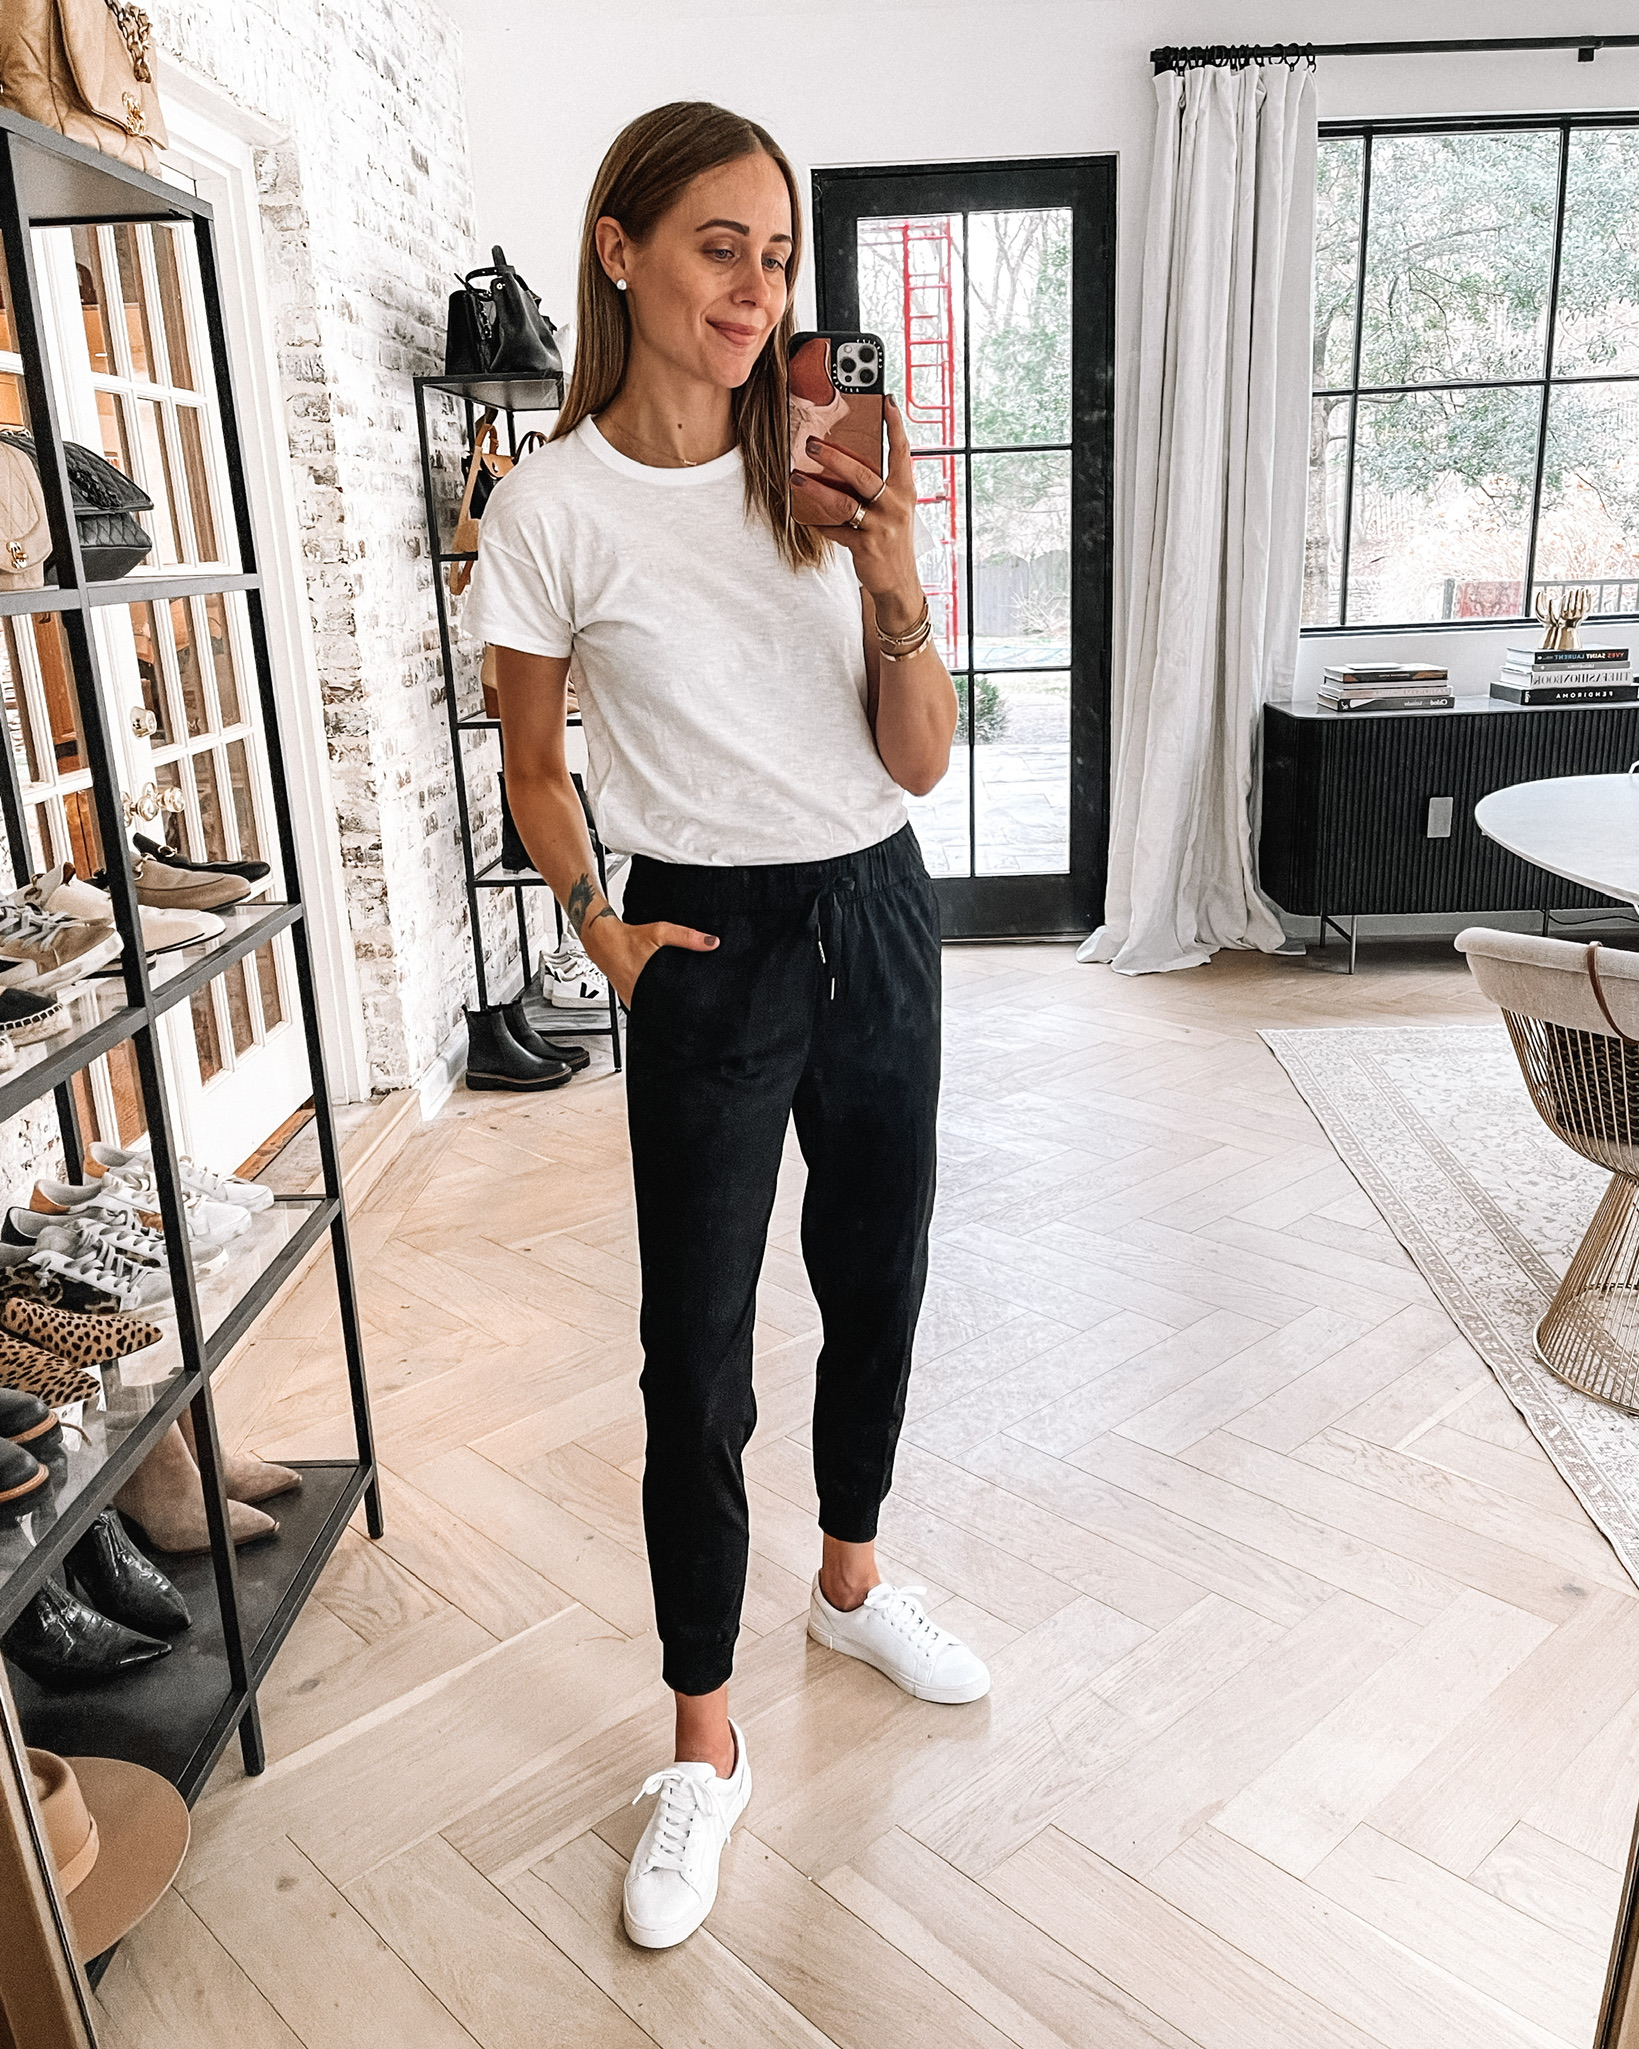 Fashion Jackson Wearing Amazon Fashion Black Joggers White Tshirt White Sneakers